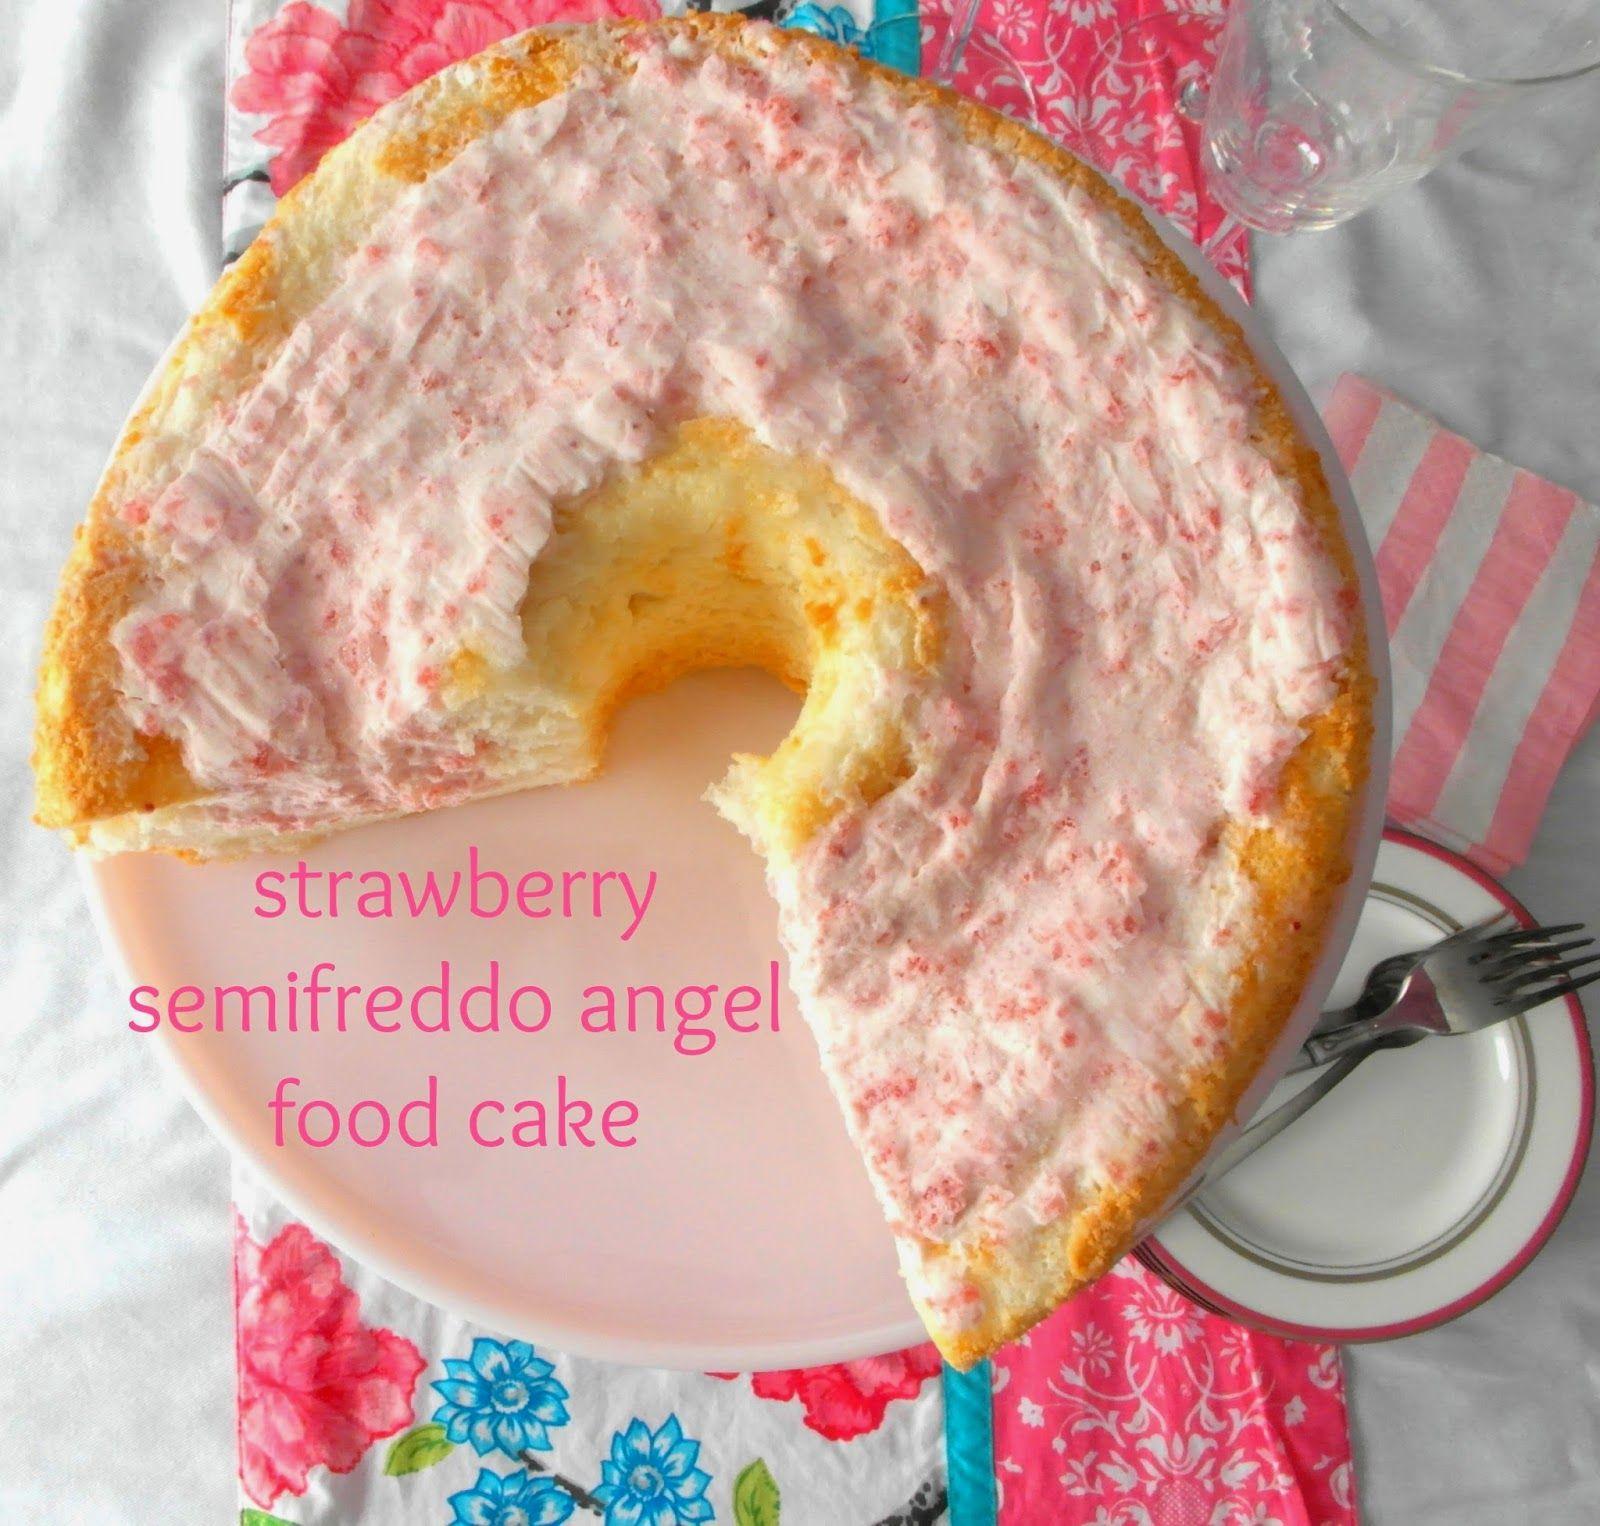 strawberry semifreddo angel food cake